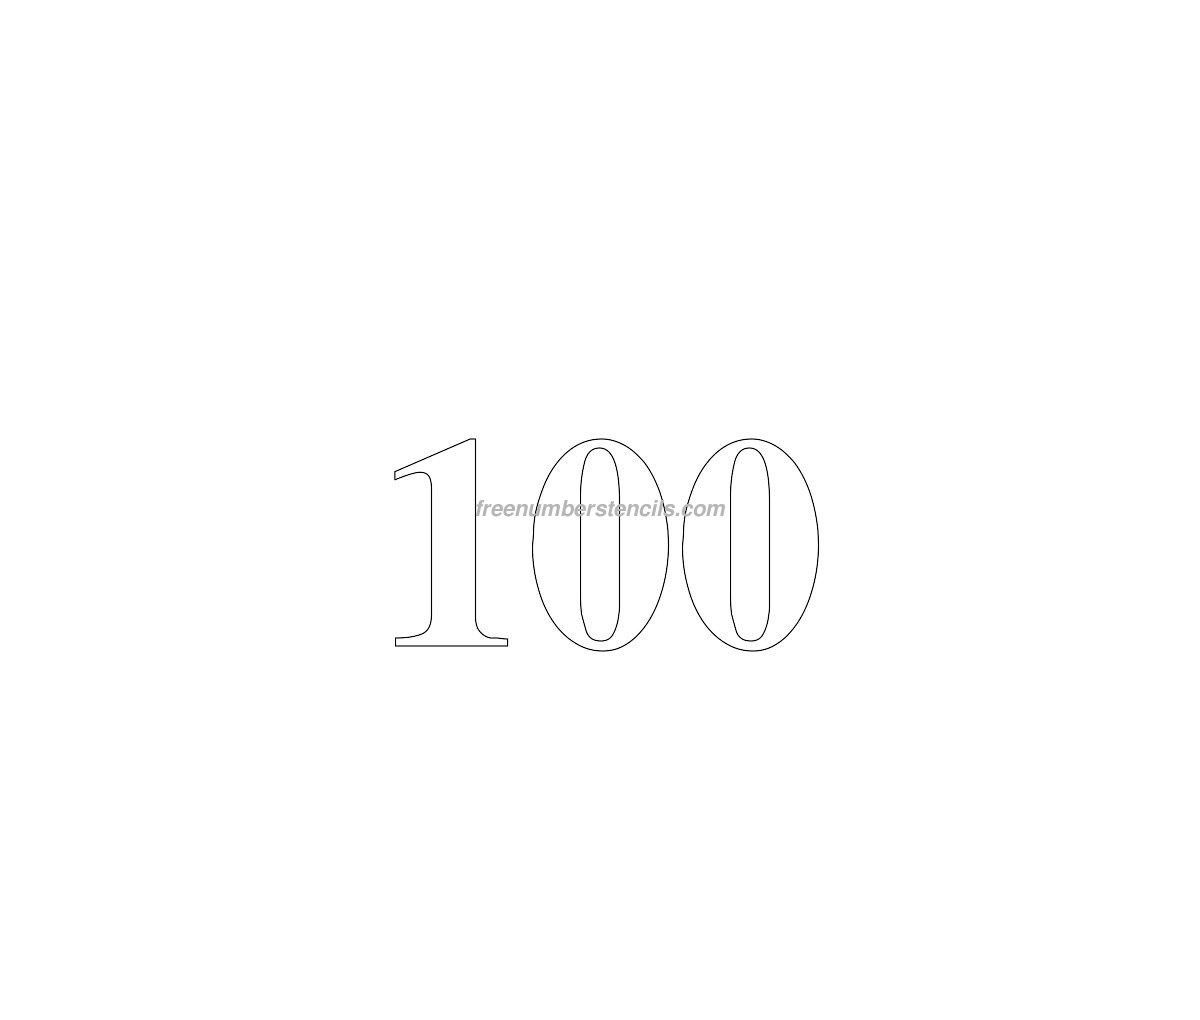 Free Huge 100 Number Stencil - Freenumberstencils.com